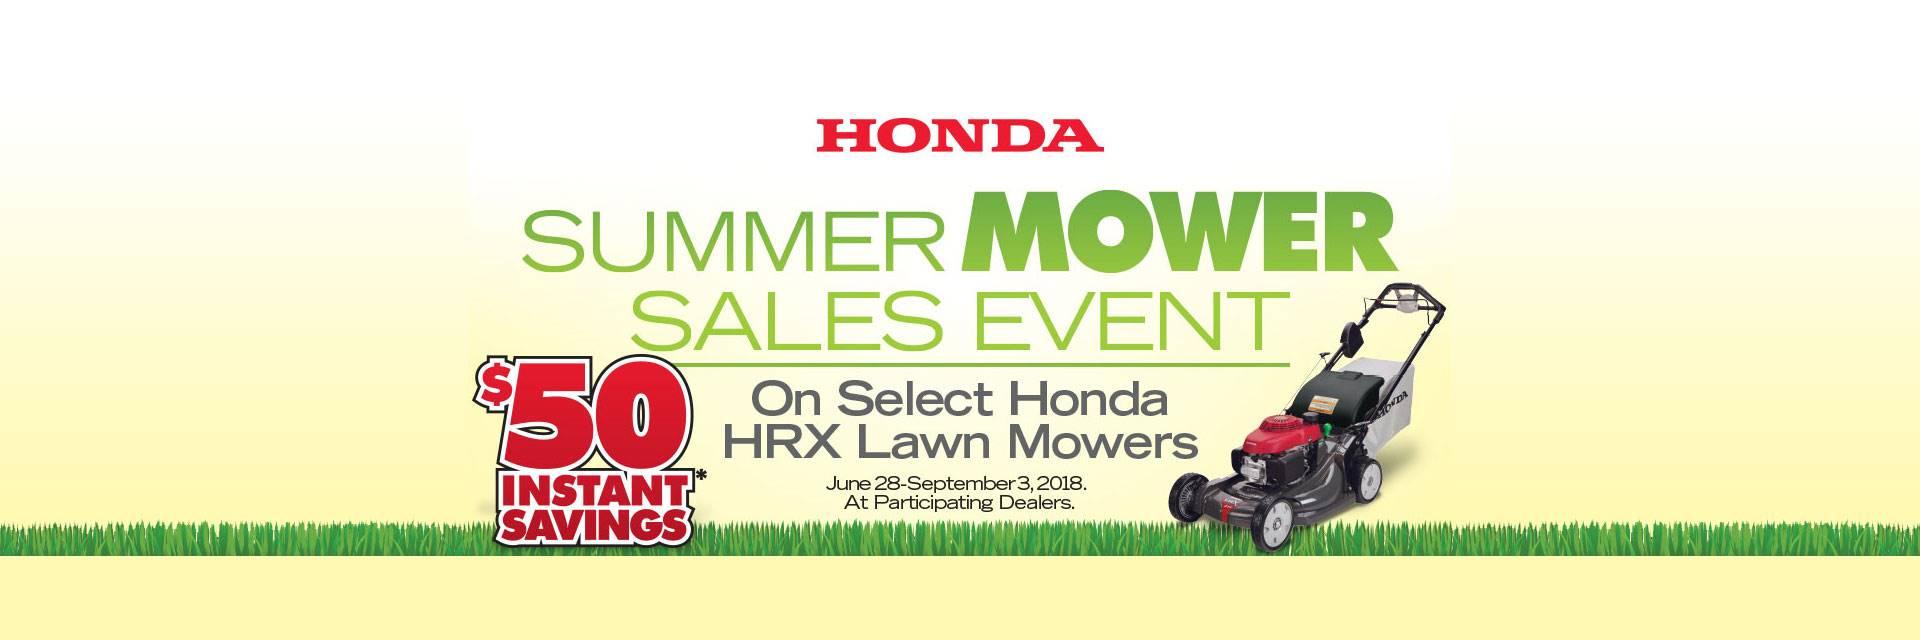 Honda Power Equipment Summer Mower Sales Event